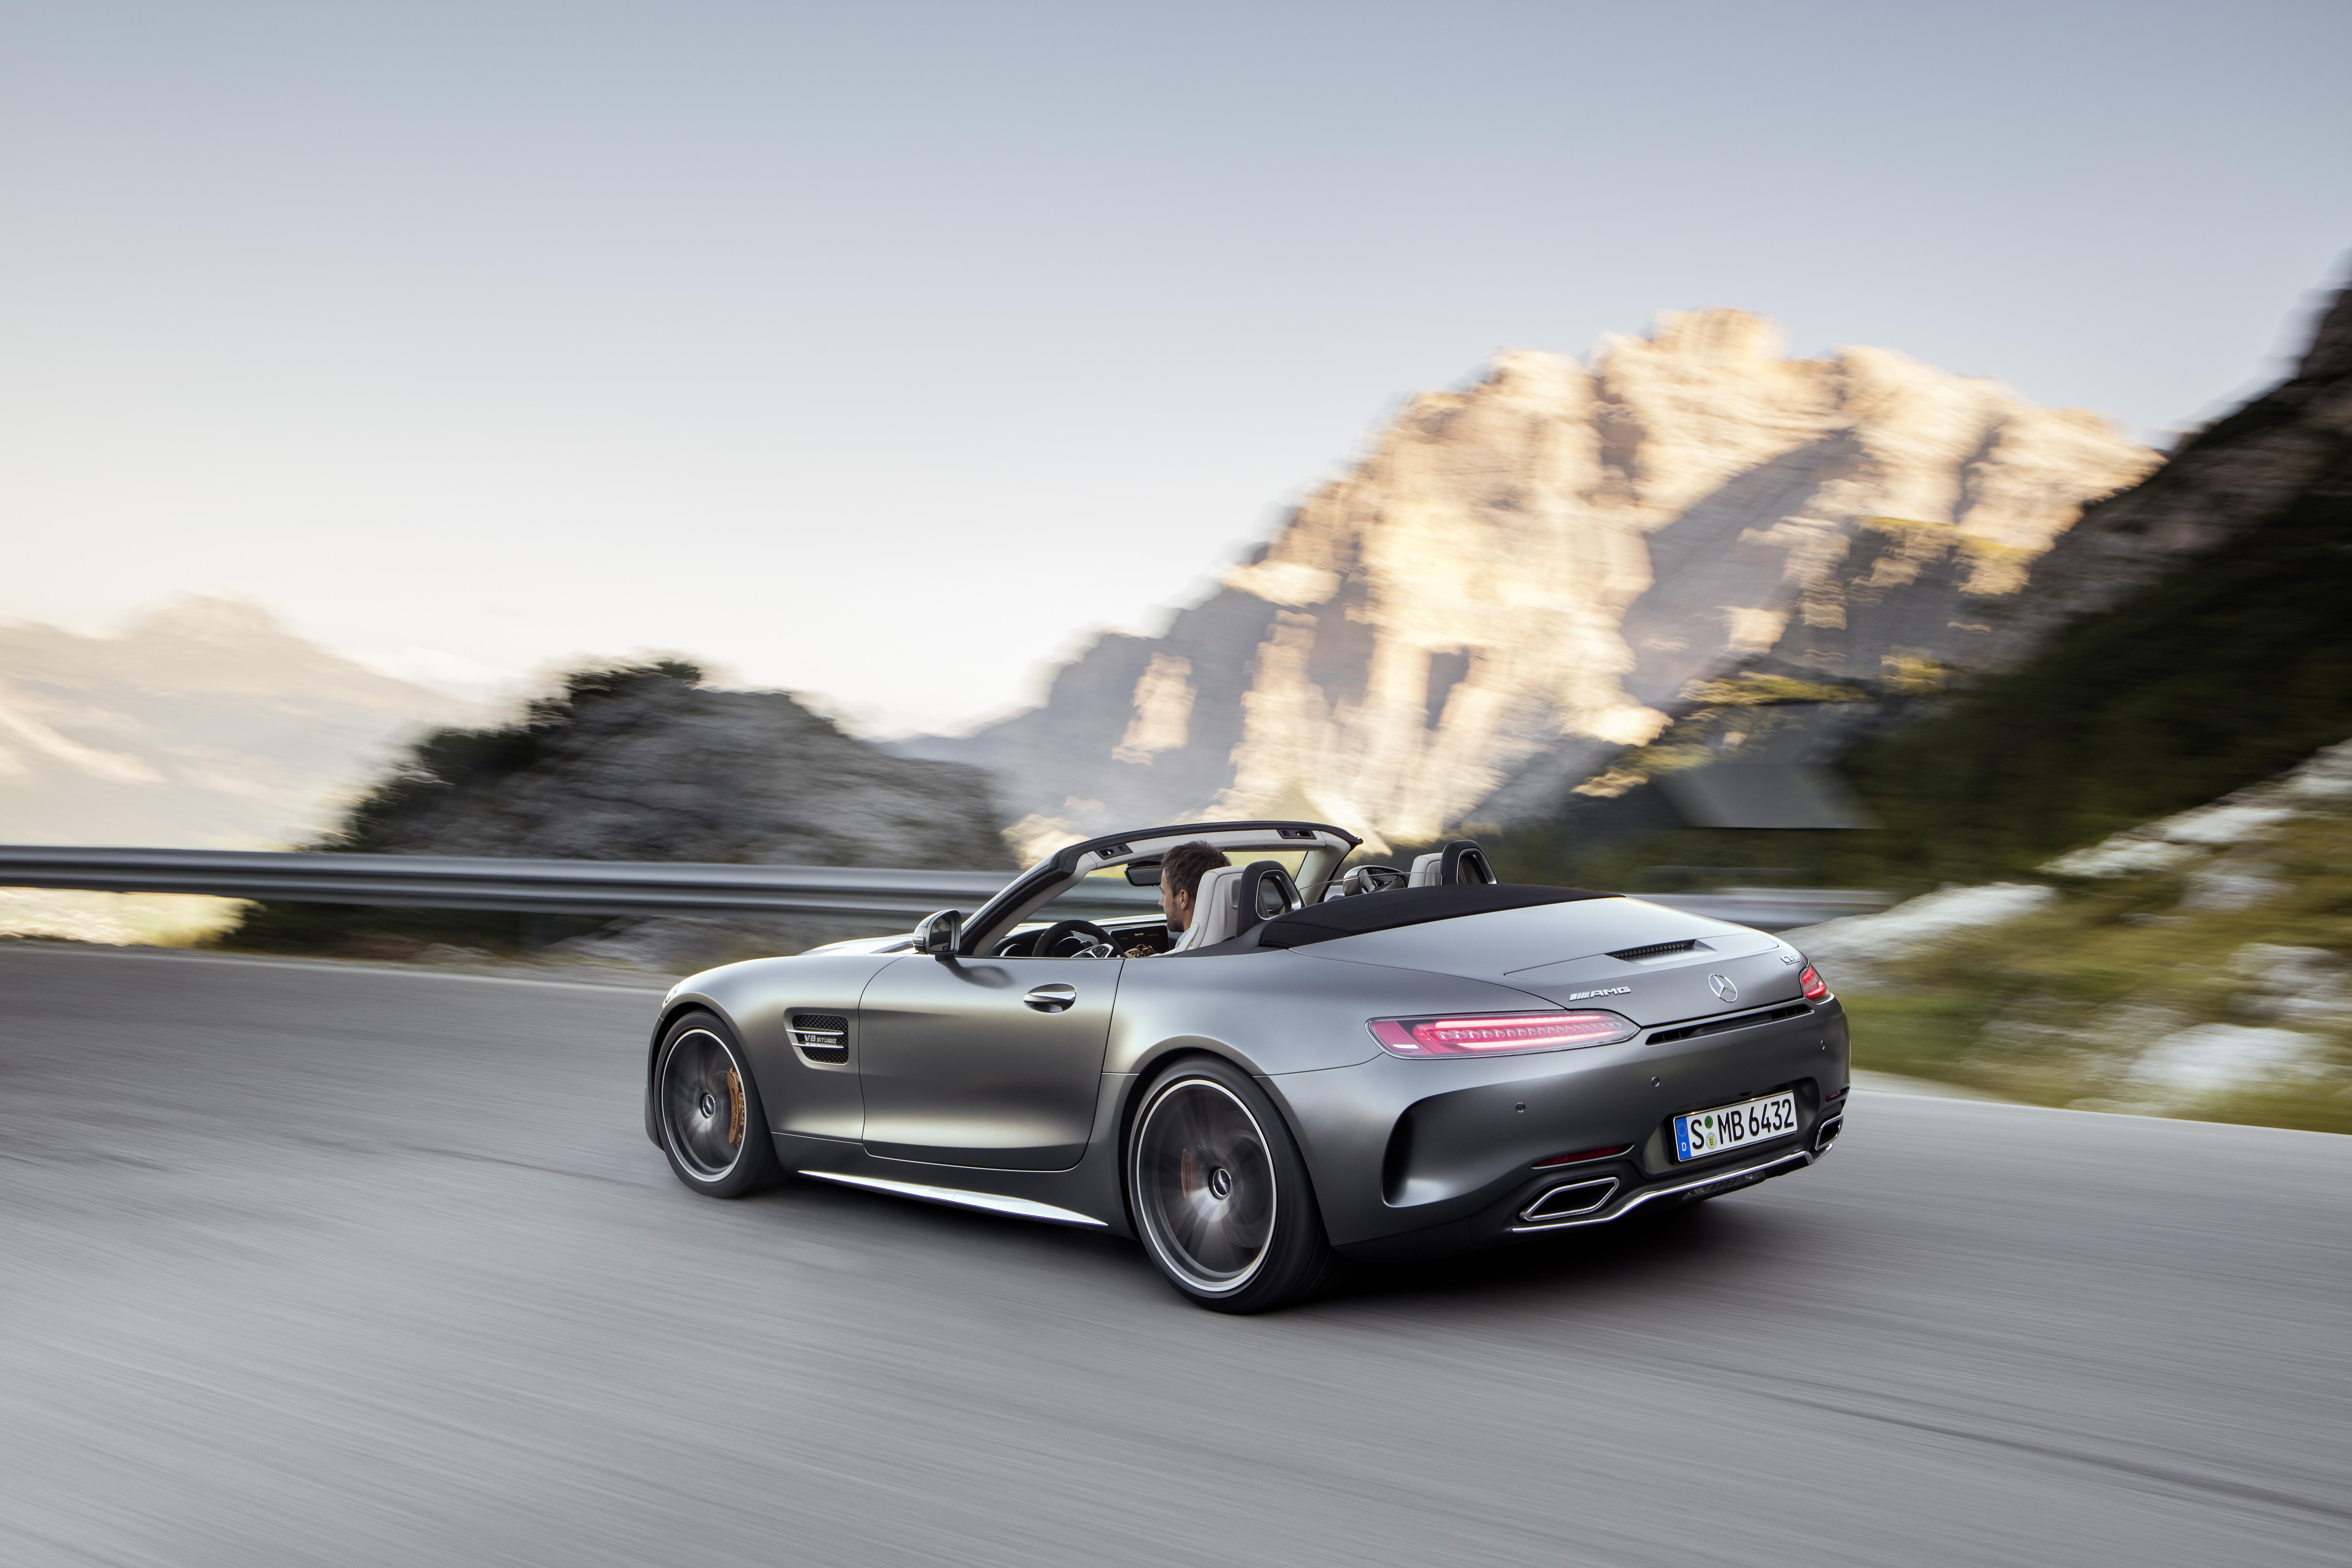 AMG GT C Roadster (R 190), 2016; Exterieur: designo selenitgrau magno; Interieur: Leder Nappa Exklusiv macchiatobeige; Kraftstoffverbrauch kombiniert: 11,4 l/100 km, CO2-Emissionen kombiniert: 259 g/km//AMG GT C Roadster (R 190), 2016; exterior: designo selenit grey magno; interior:Nappa leather exclusive macchiato beige; fuel consumption, combined: 11.4 l/100 km; combined CO2 emissions: 259 g/km